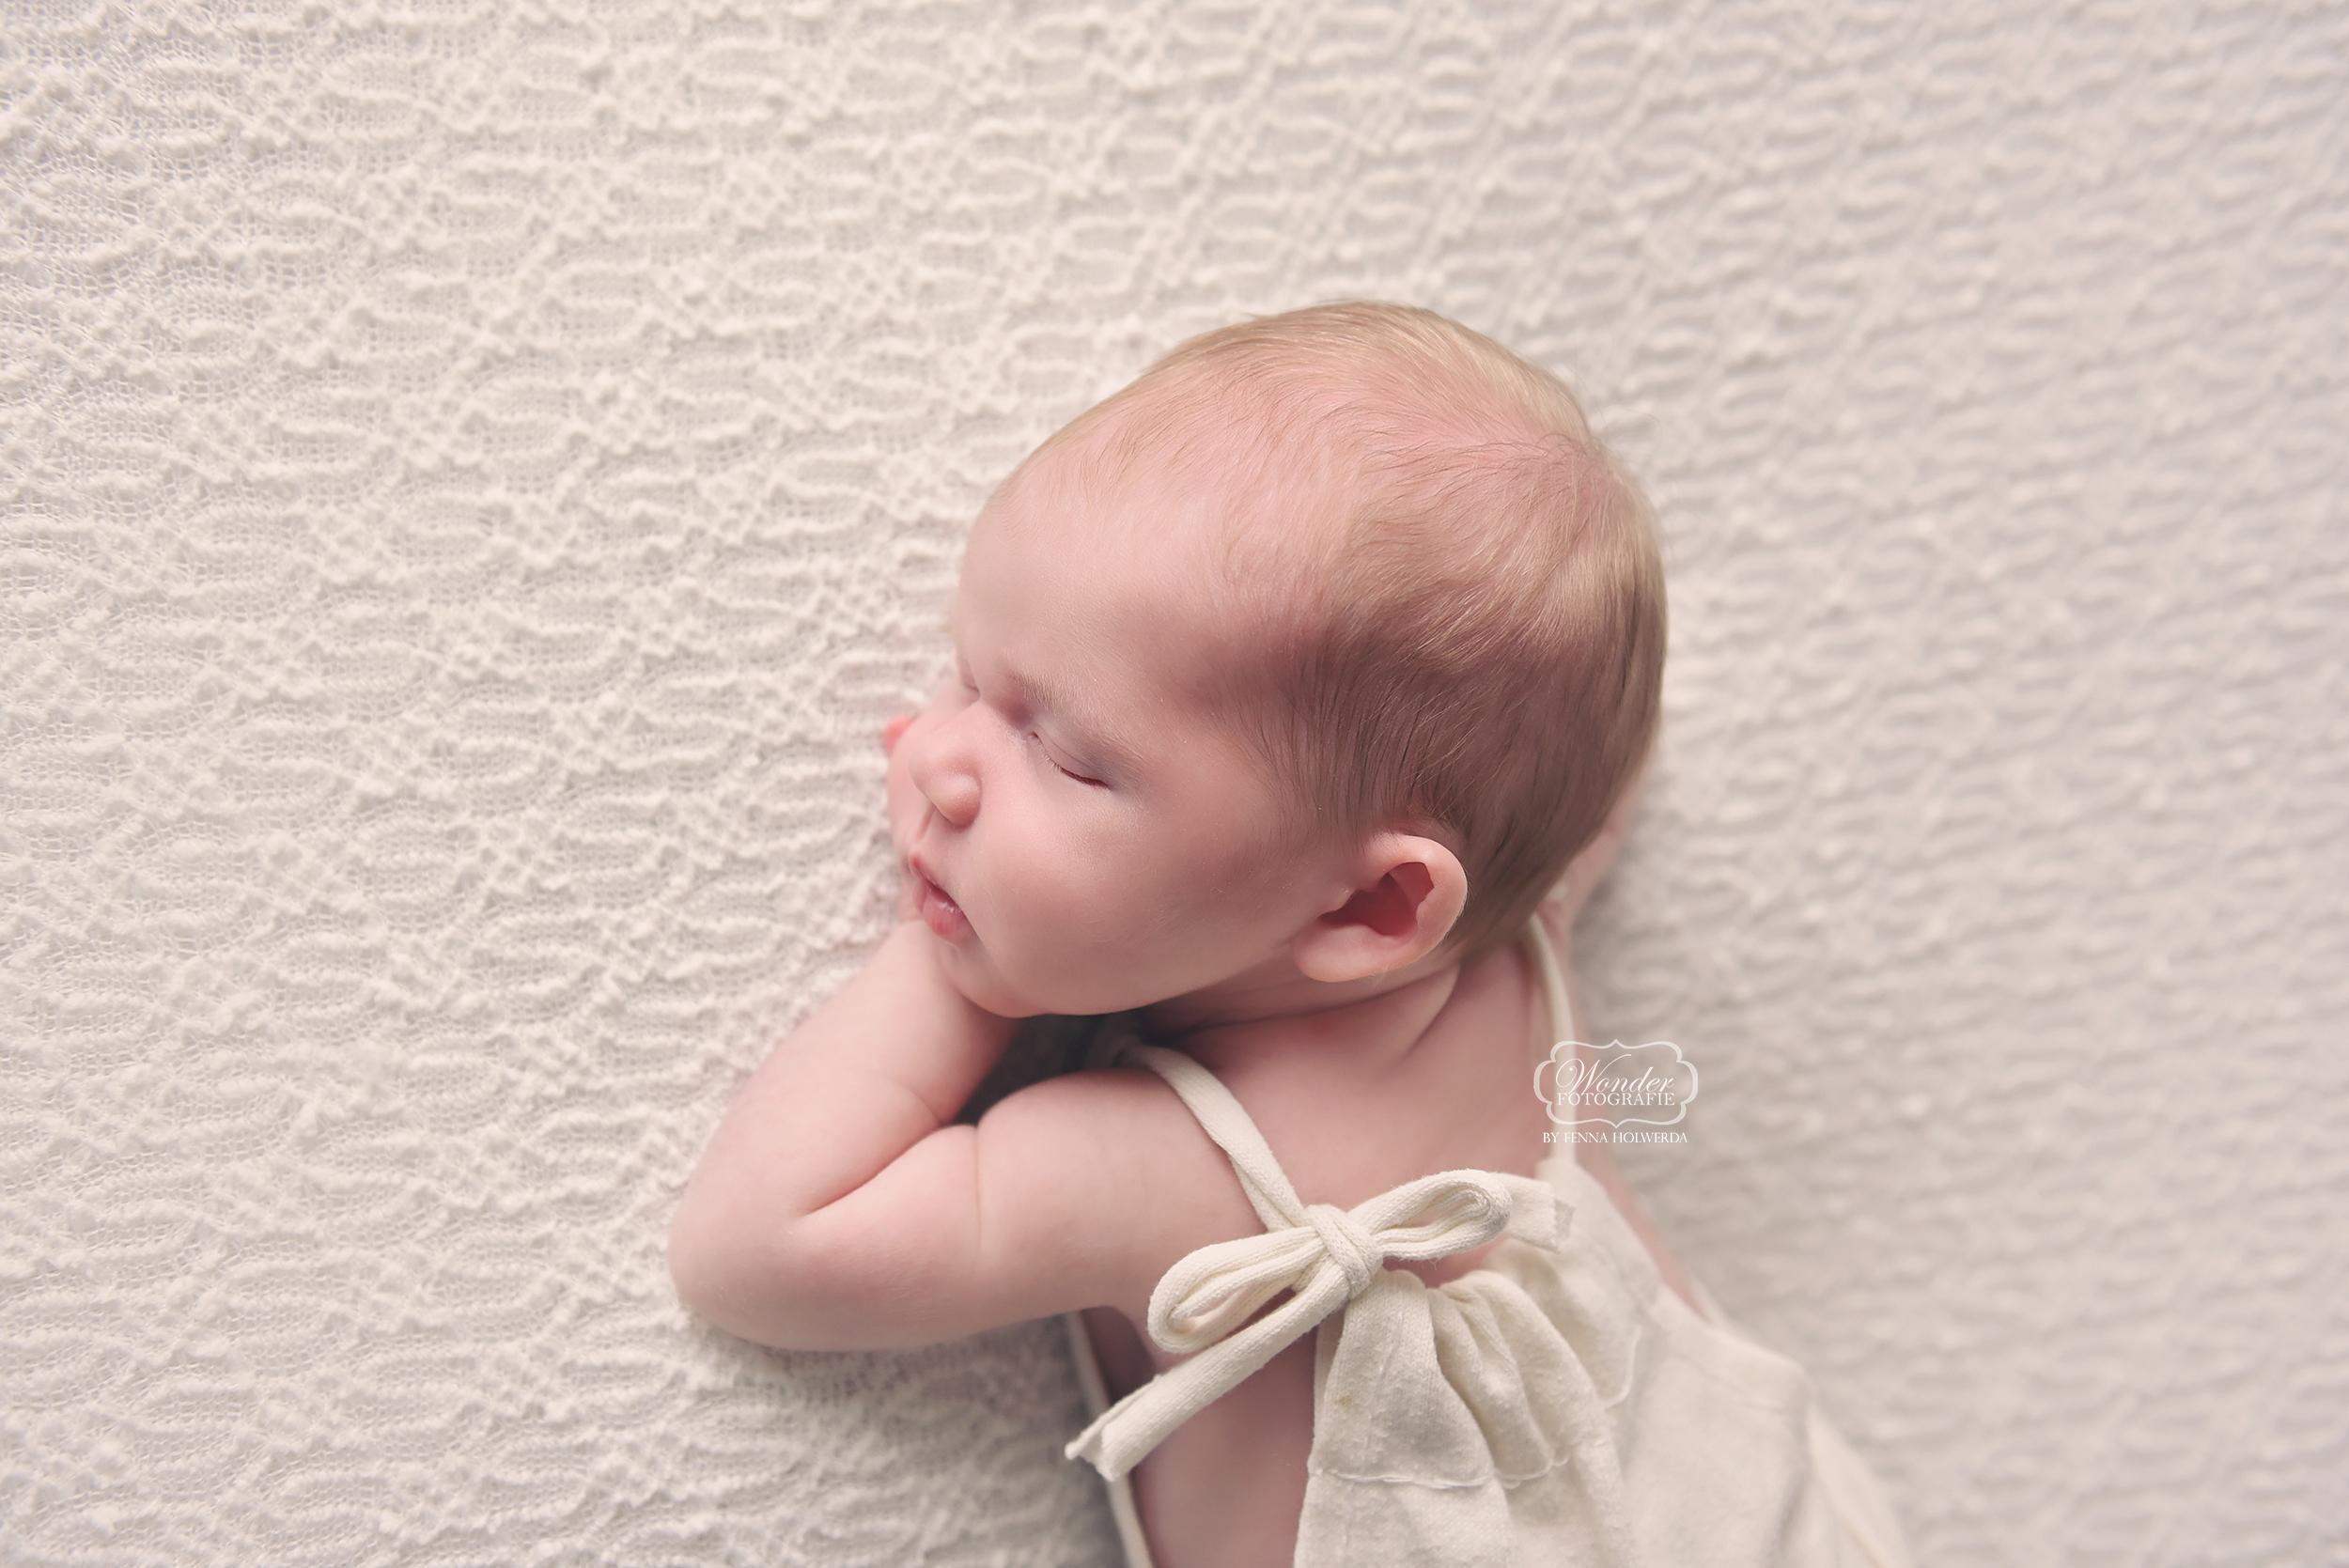 Newborn baby fotoshoot fotograaf